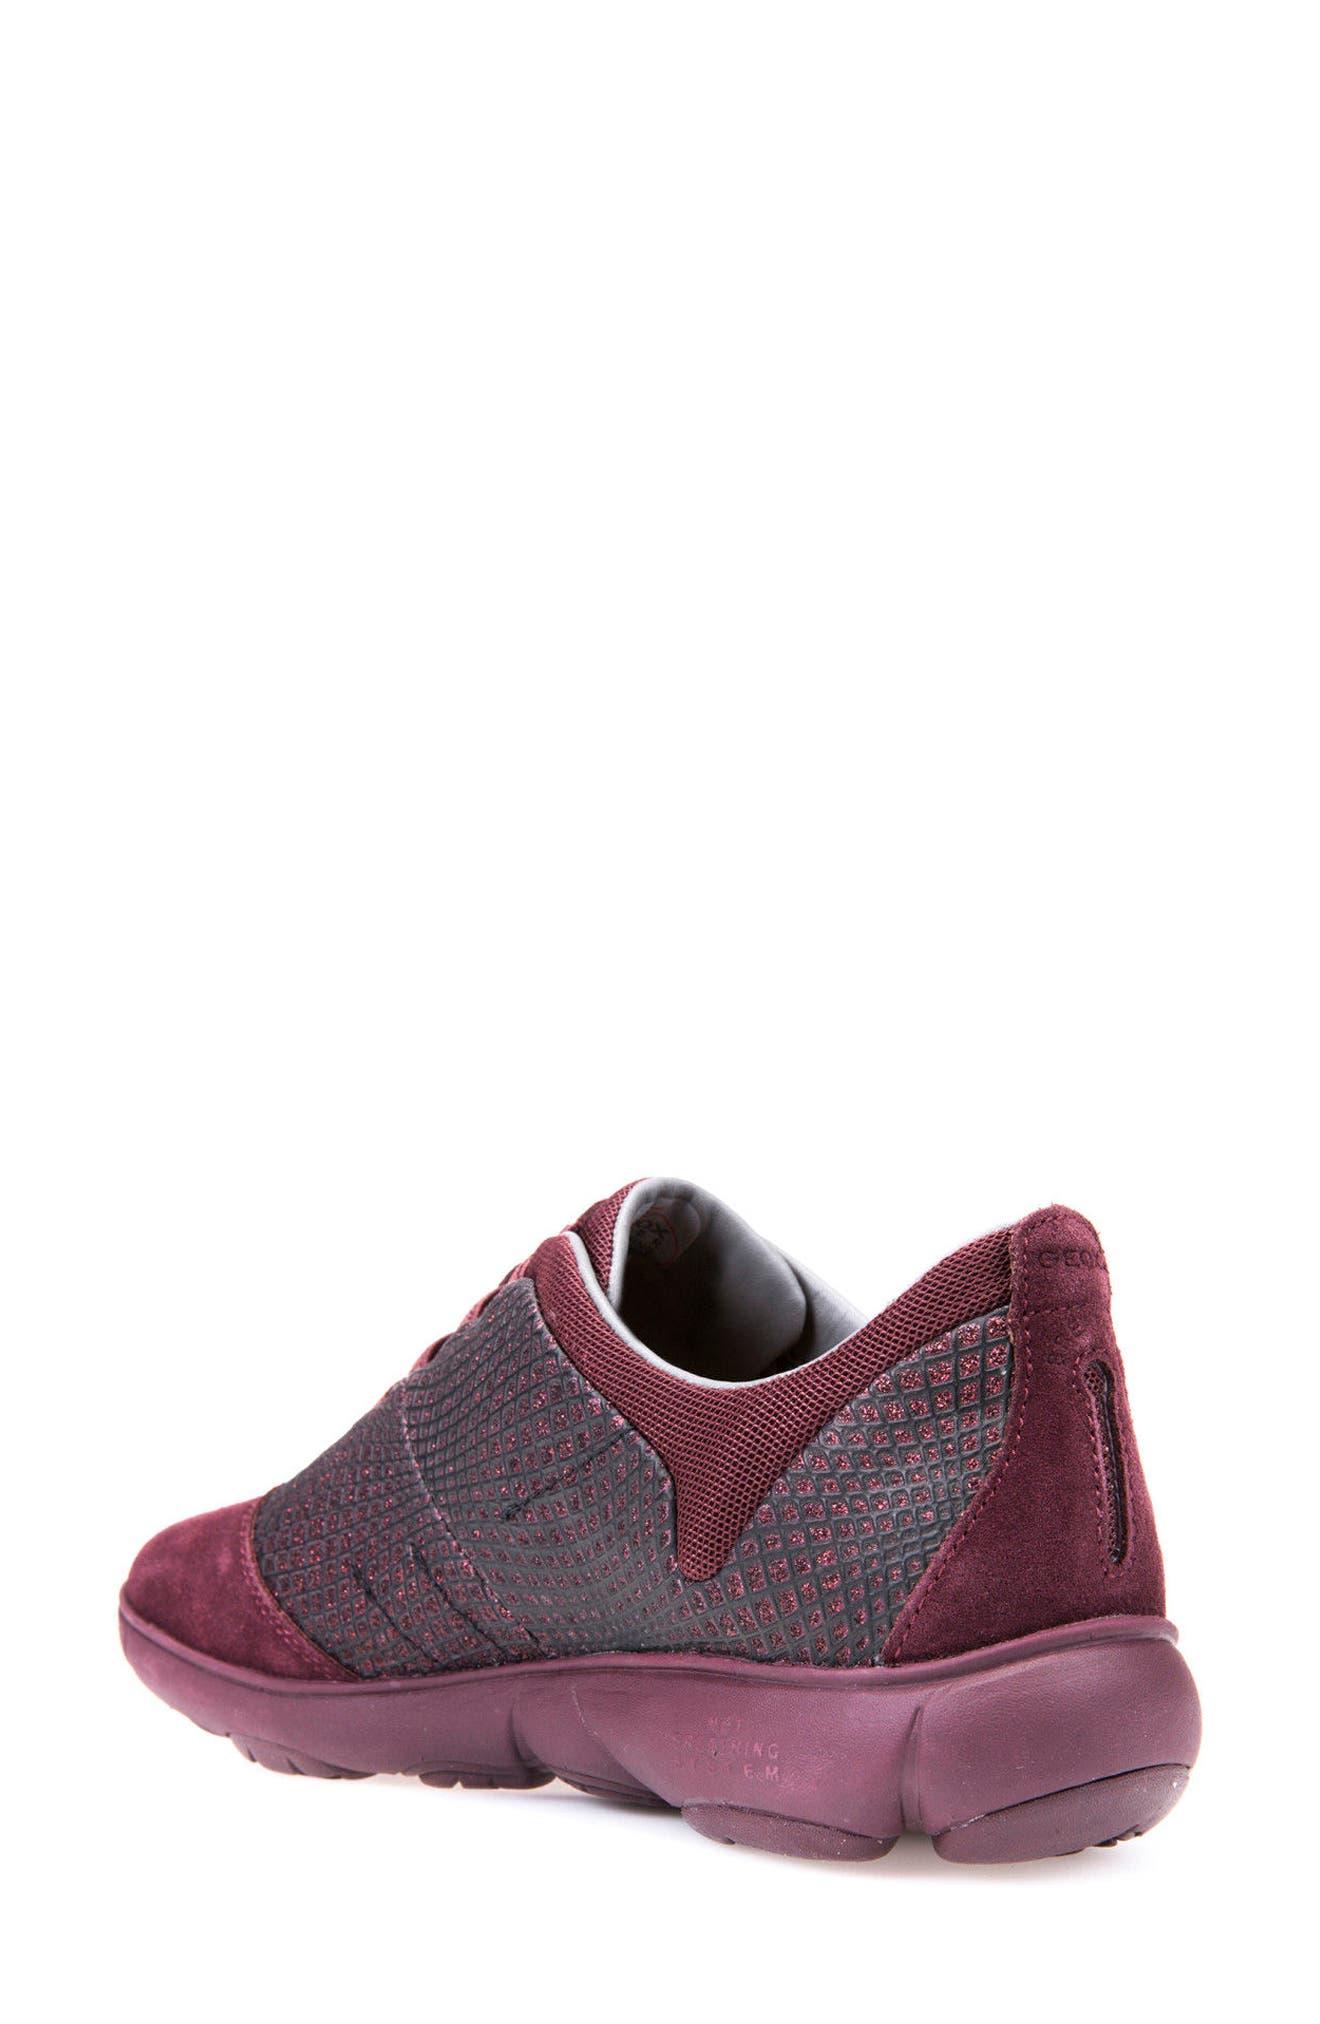 Alternate Image 2  - Geox Nebula Slip-On Sneaker (Women)